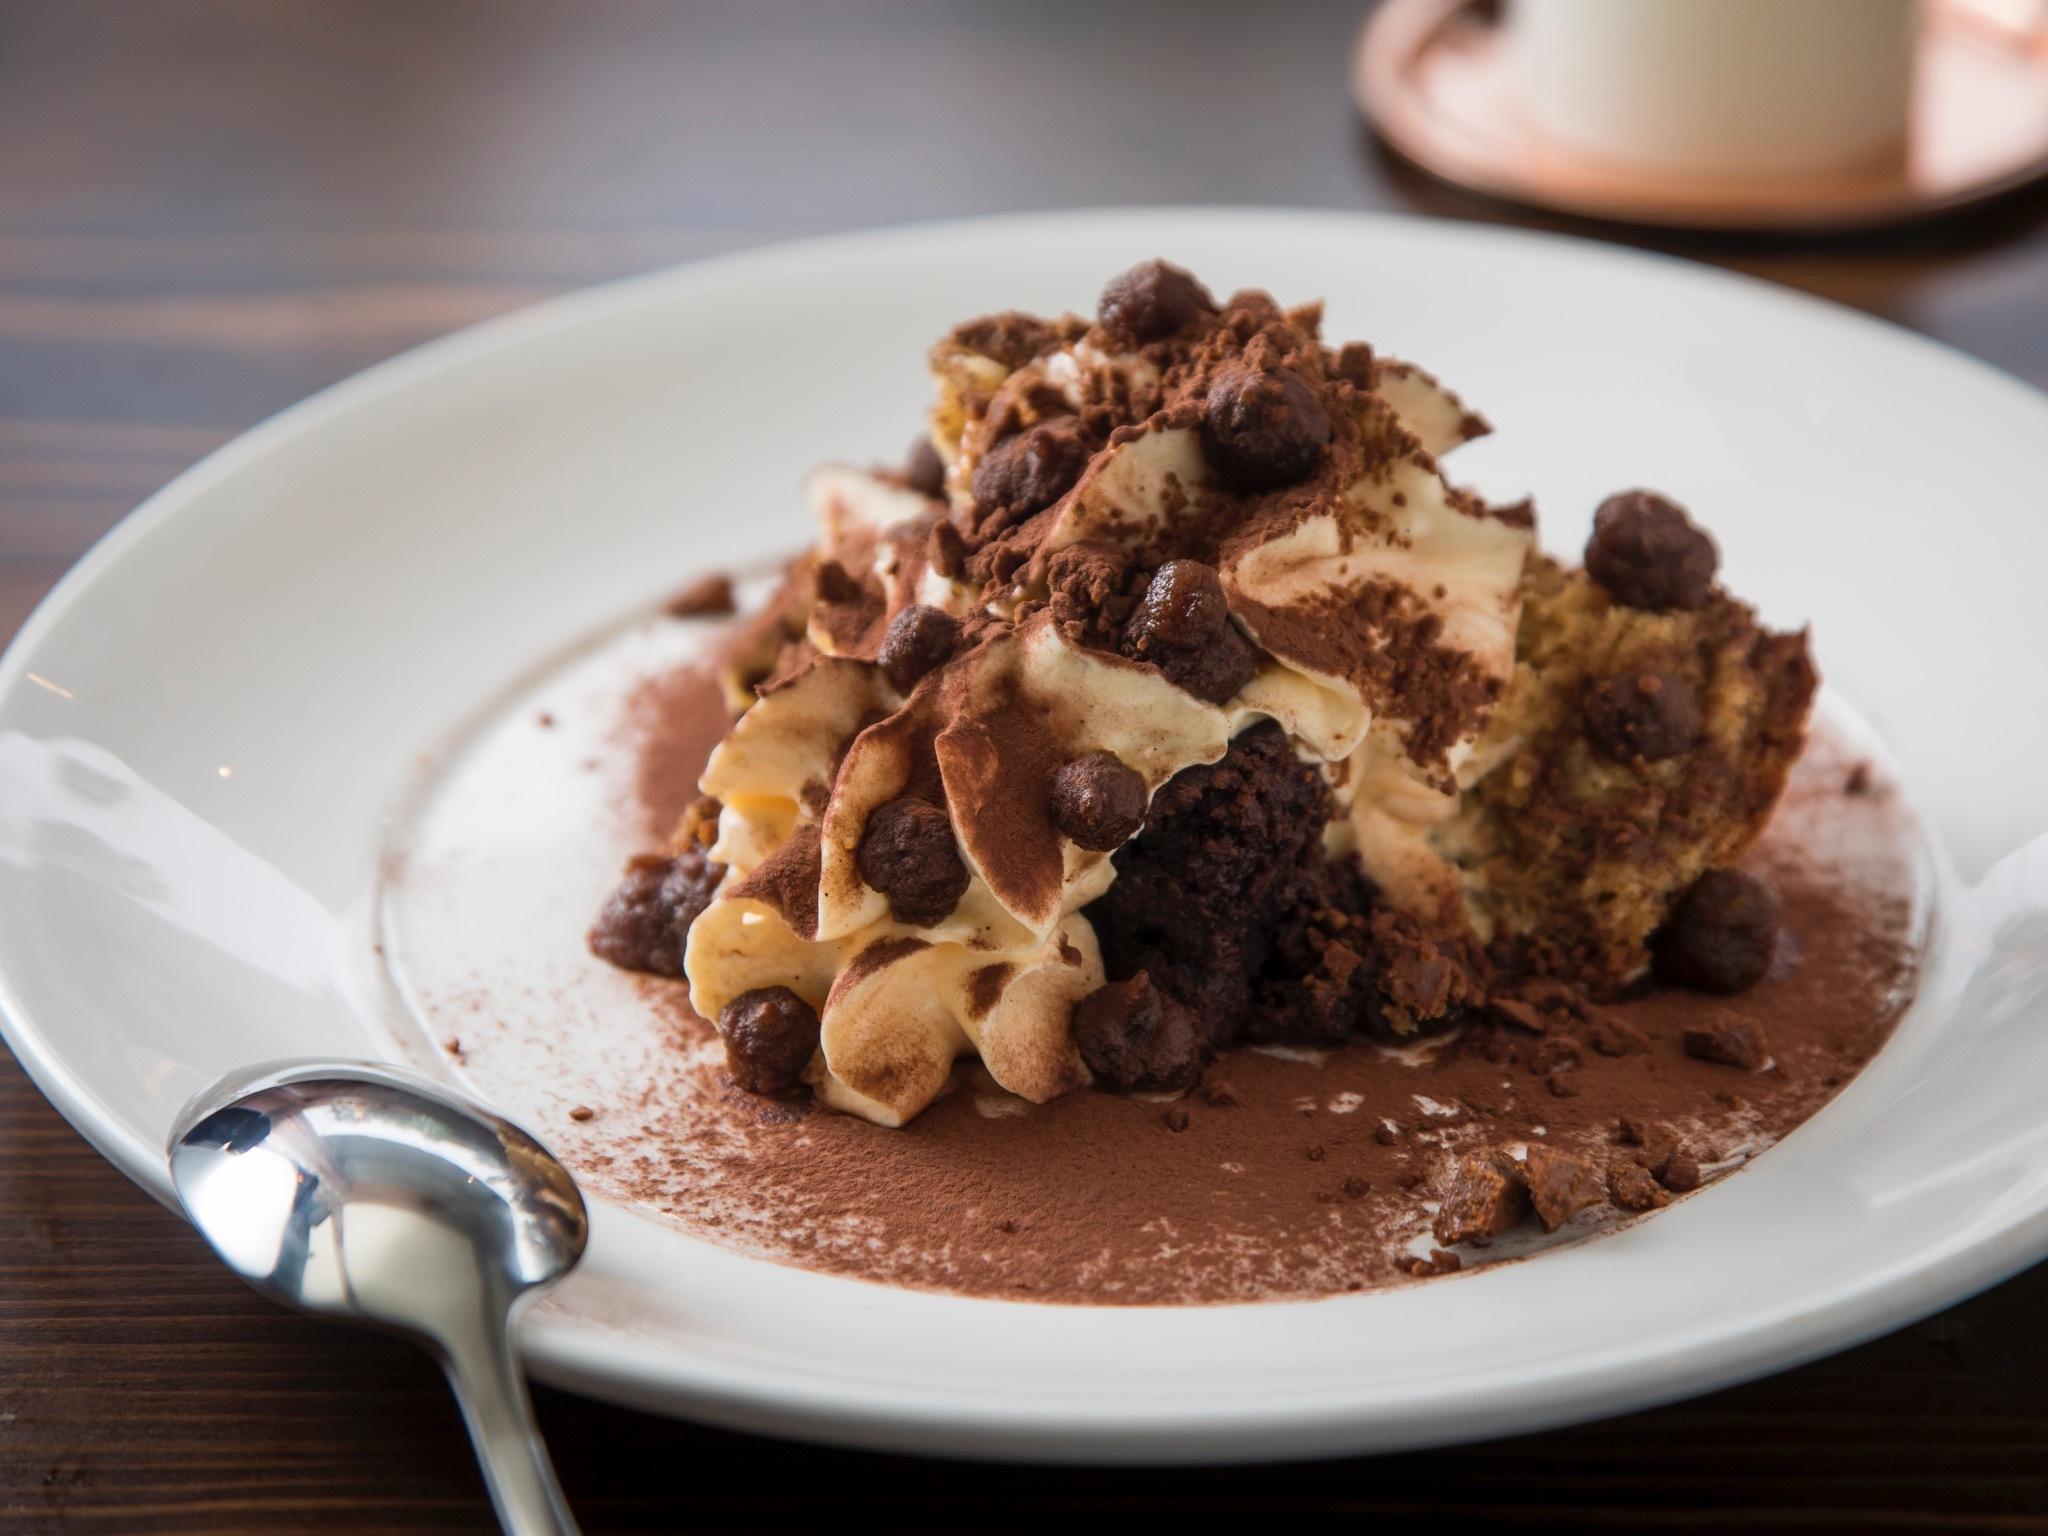 Dessert at Pino Vino e Cucina